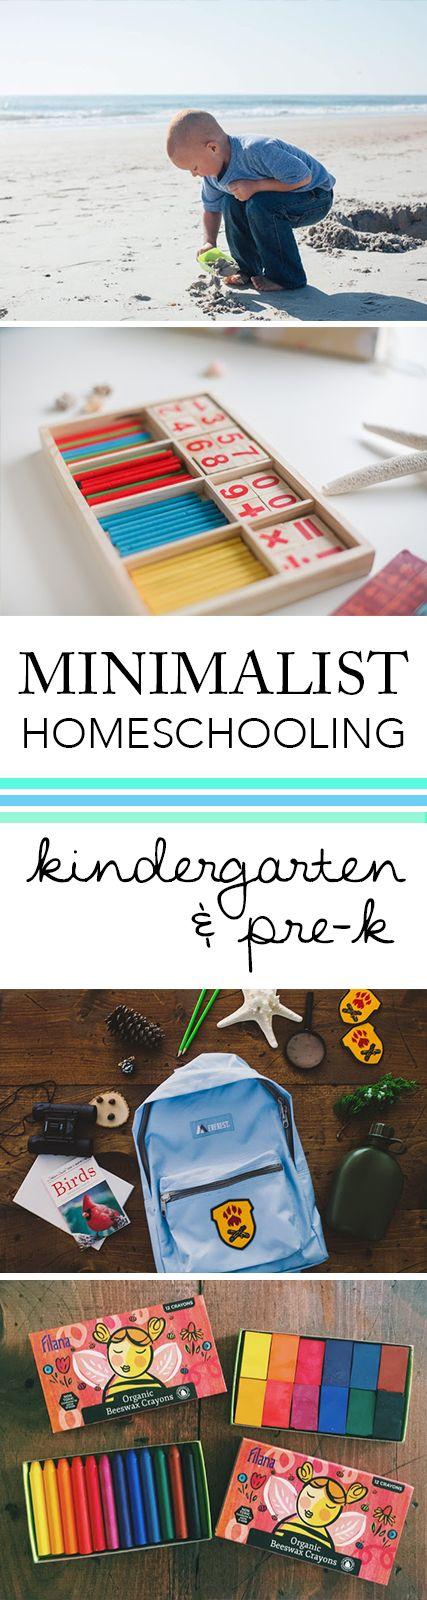 Minimalist Homeschool Pre-K + Kindergarten | Salt + Sea | Coastal Bohemian Homeschool Lifestyle Blog